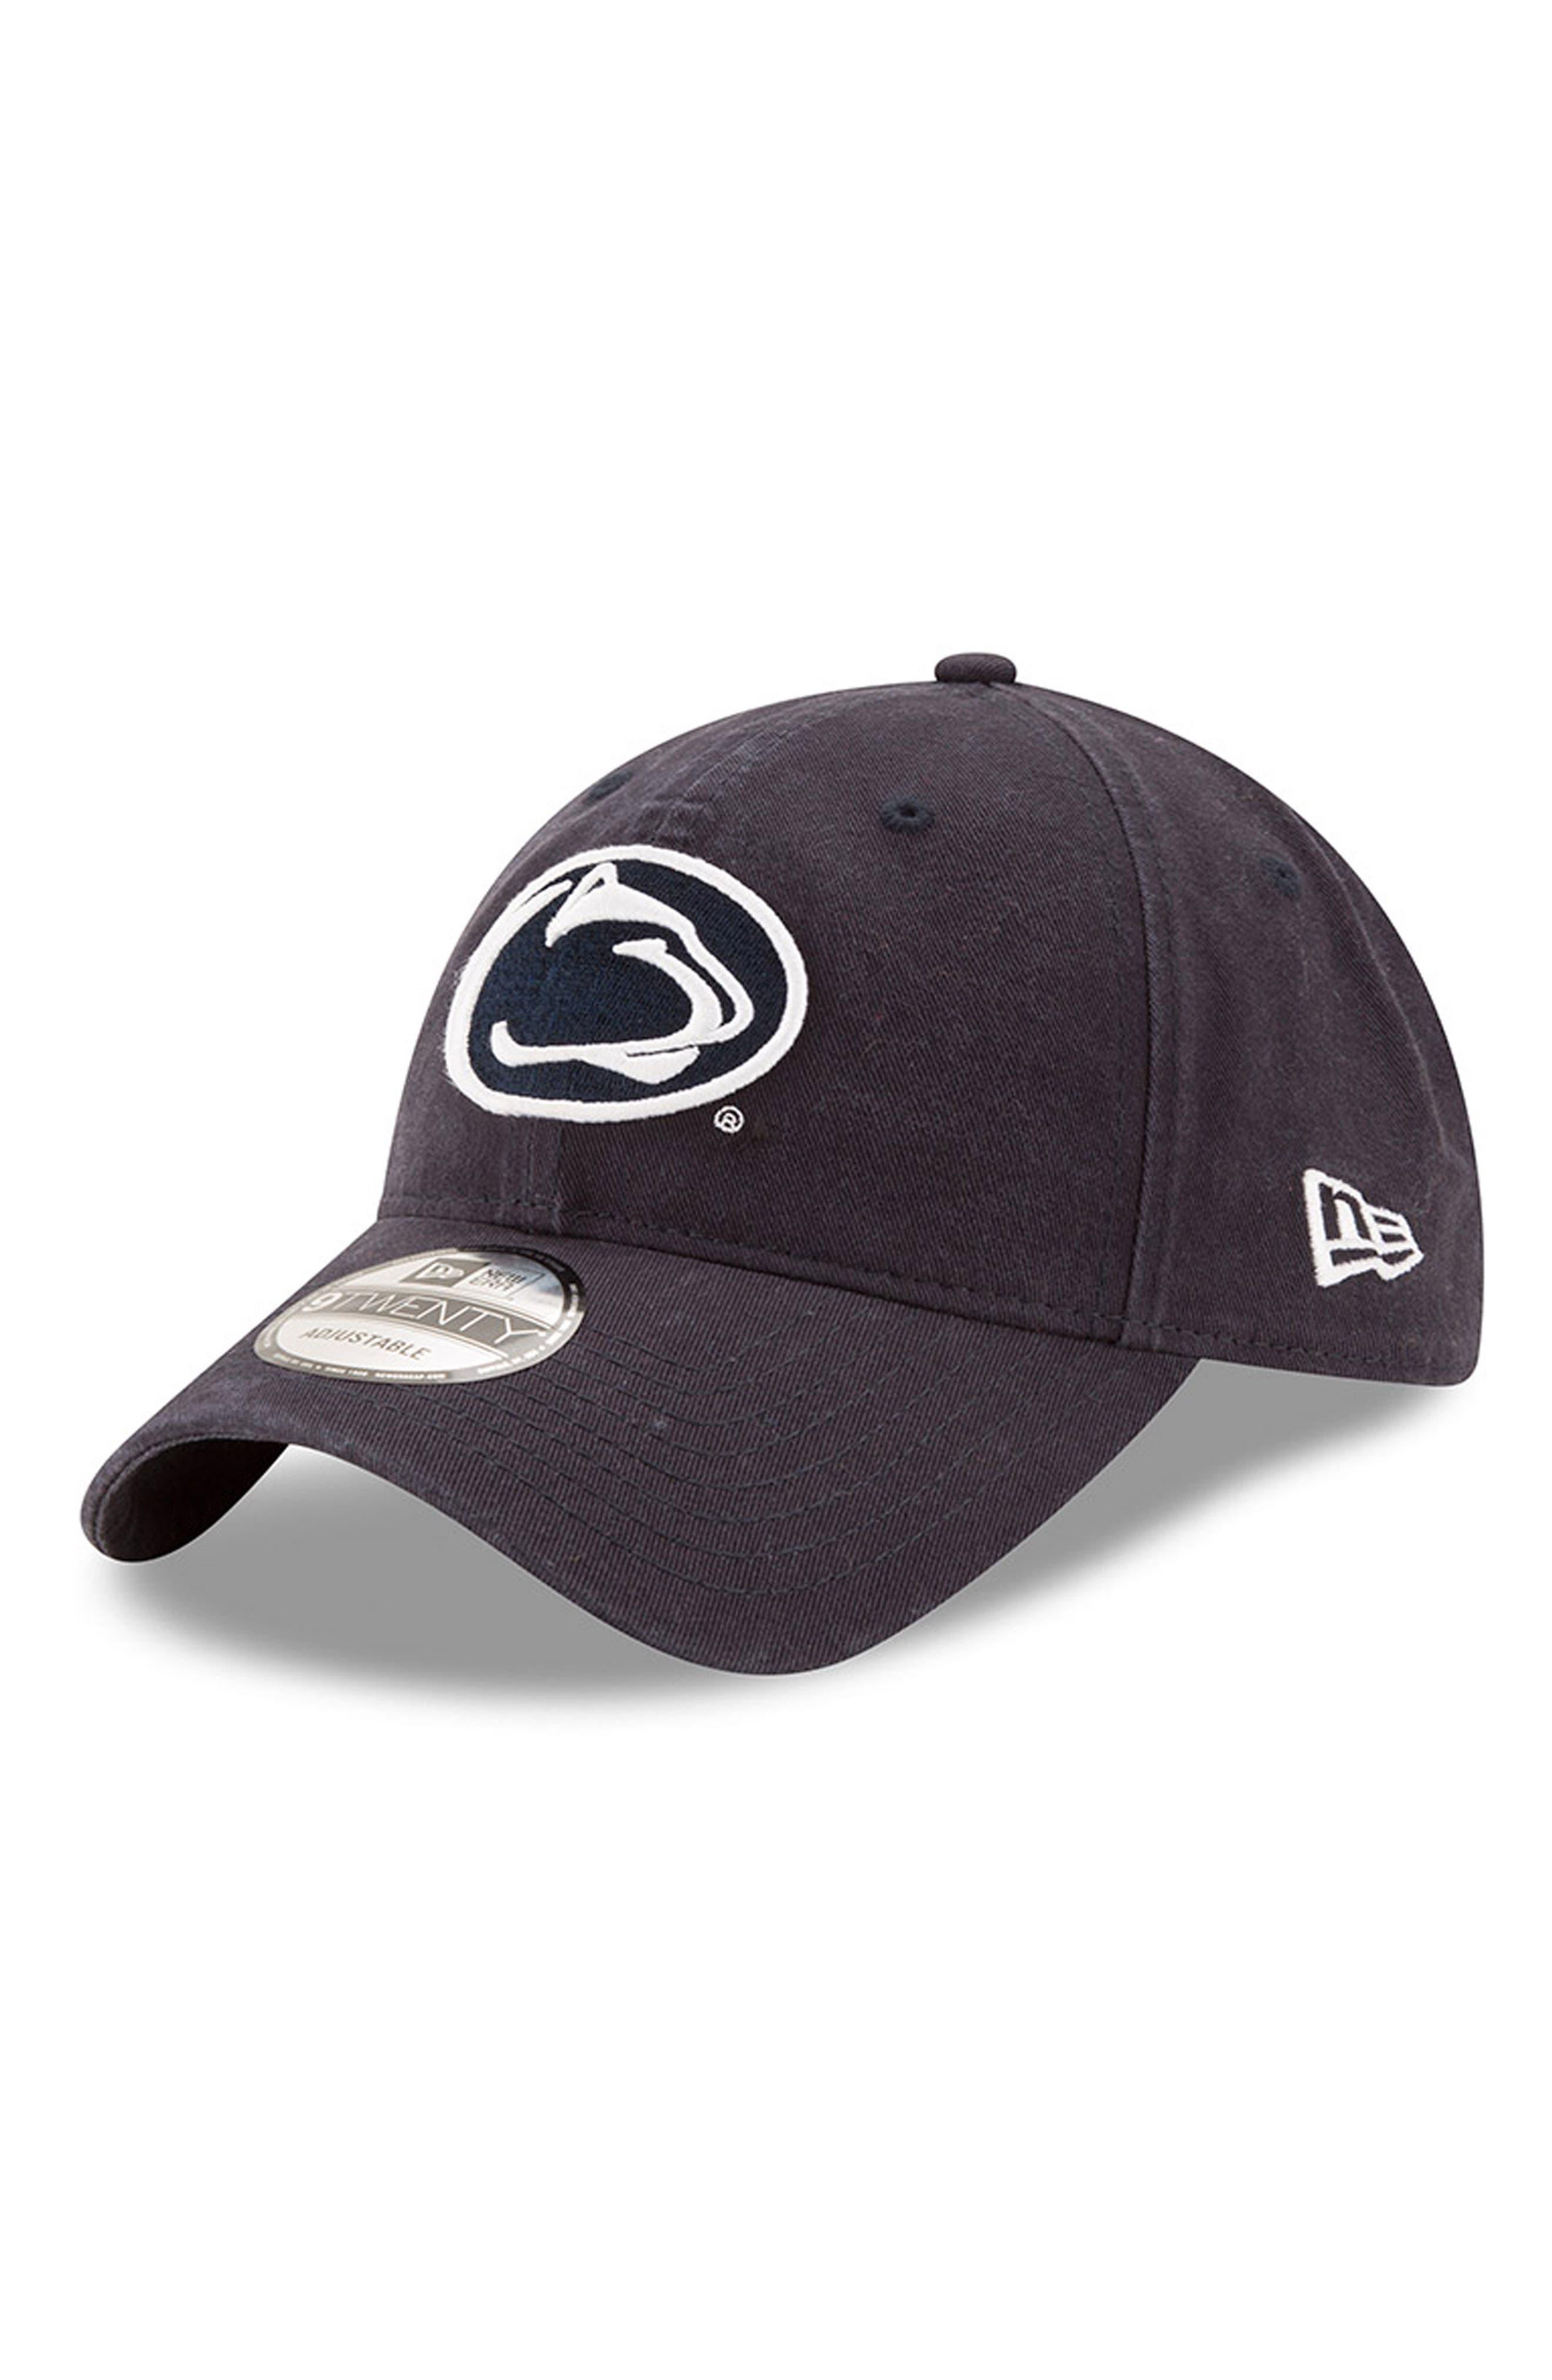 New Era Collegiate Core Classic - Penn State Nittany Lions Baseball Cap,                             Main thumbnail 1, color,                             Penn State Nittany Lions